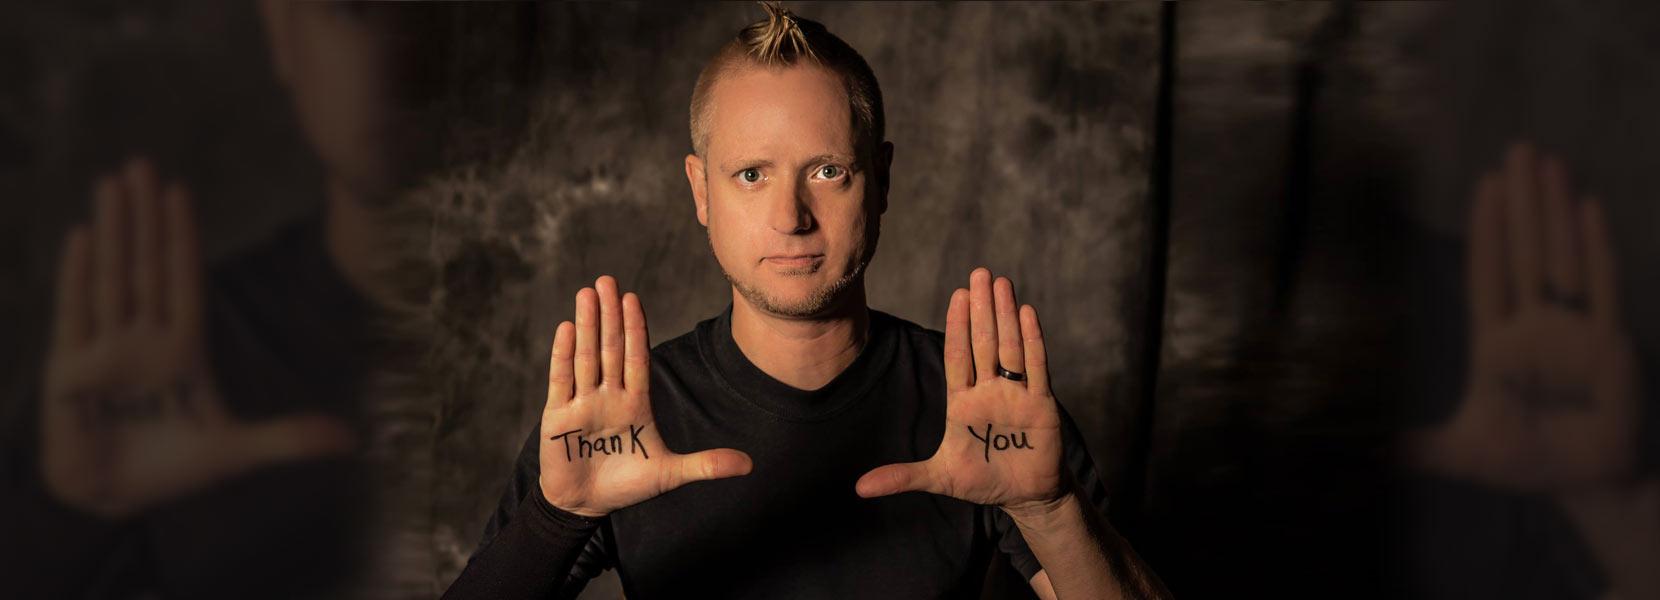 http://kamillamusic.com/wp-content/uploads/2014/11/BFB-Thank-you.jpg